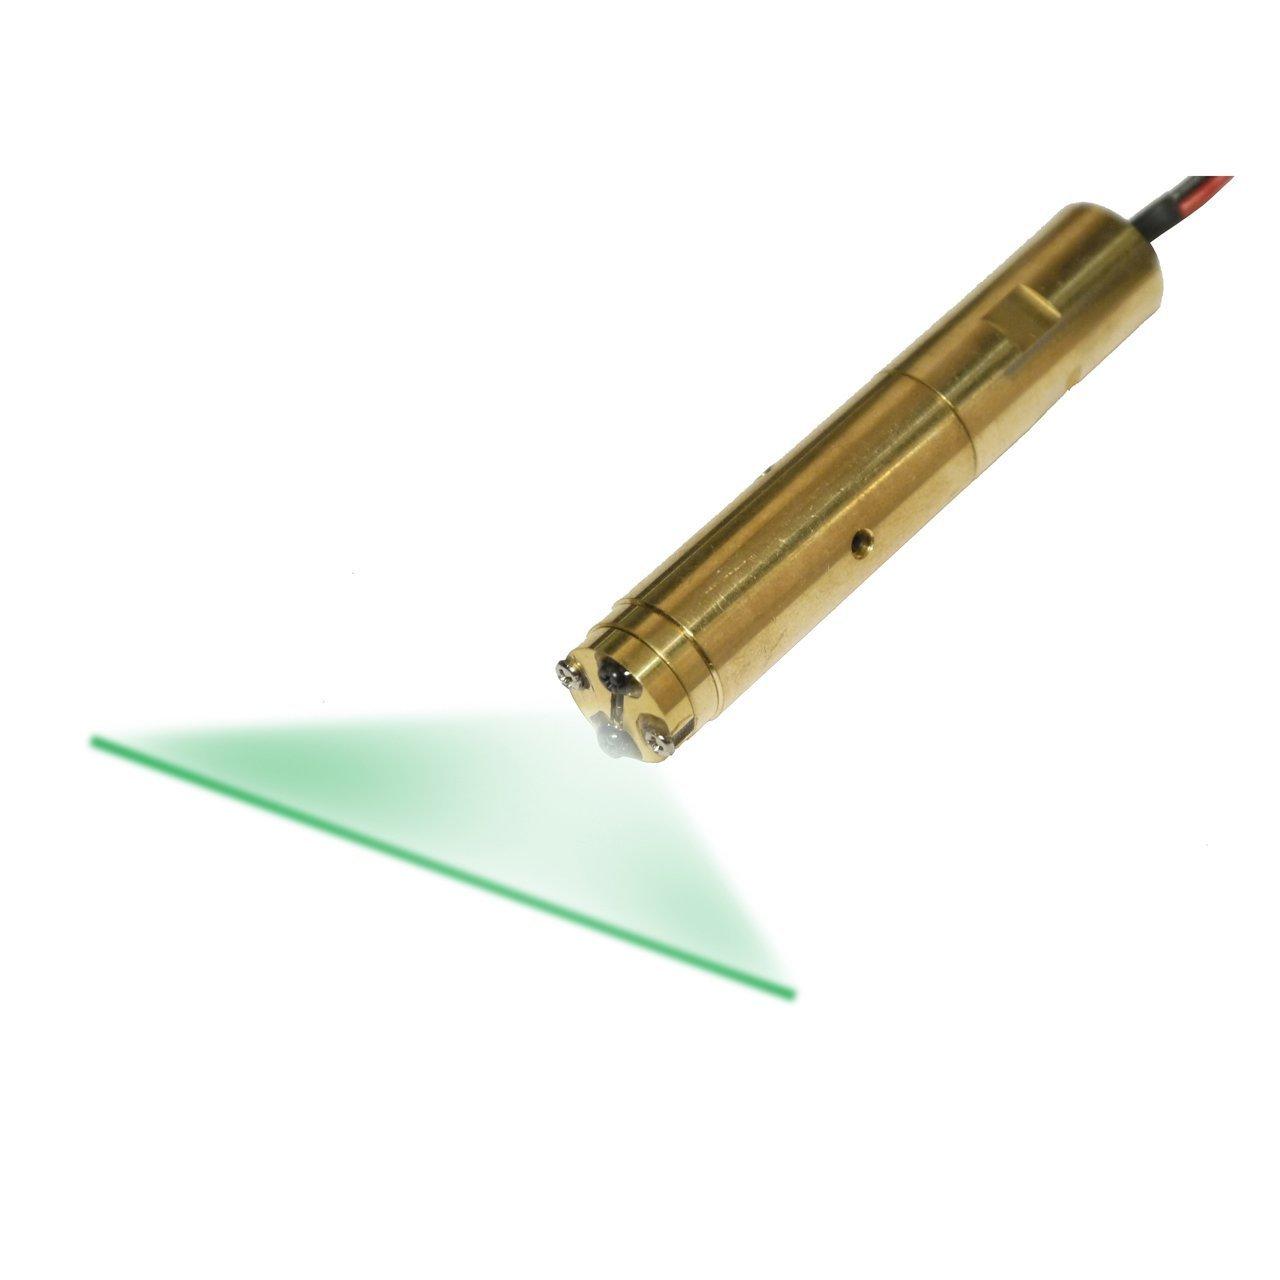 Quarton Laser Module VLM-532-46 LPT (GREEN LINE LASER) Laser line accuracy: 20'' (+/- 1mm @10m) by Infiniter